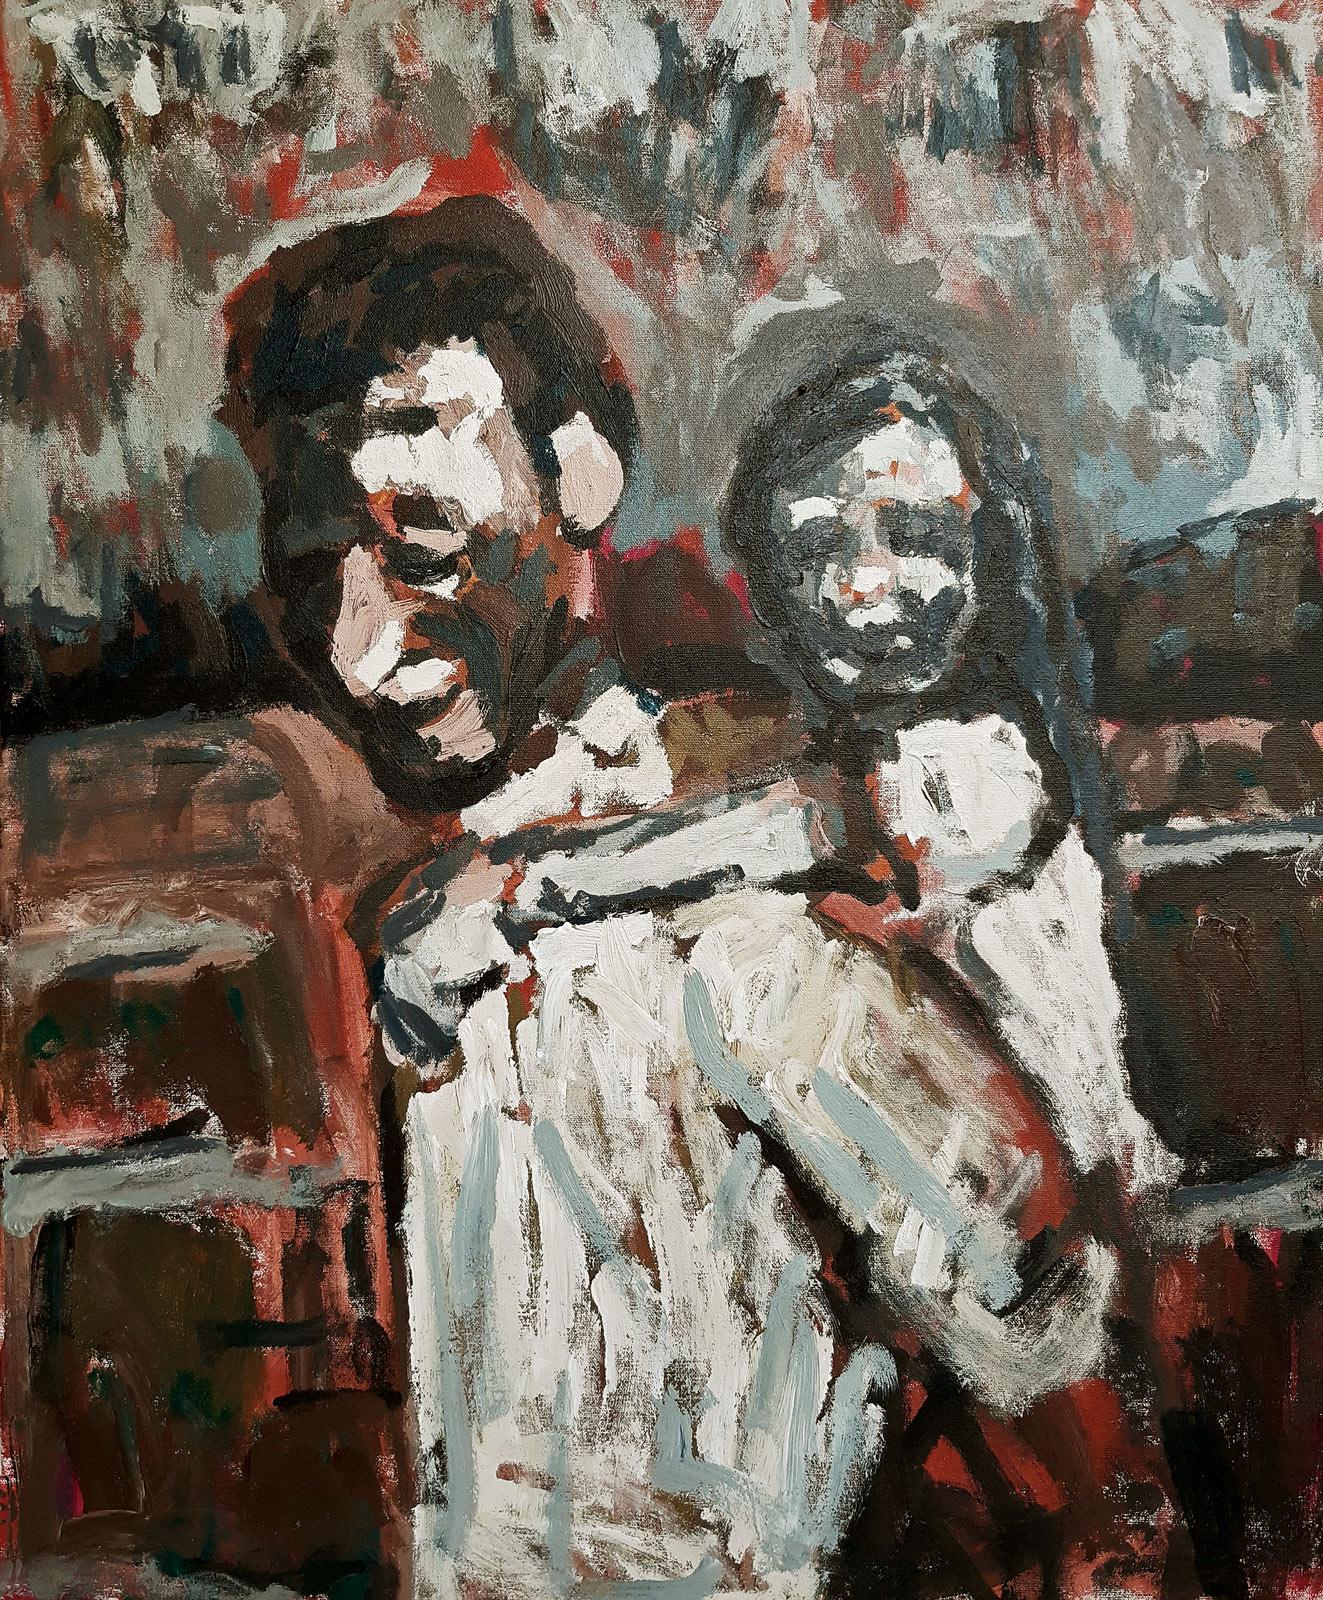 Helga and Father  Acrylic on canvas  70x86cm  2019